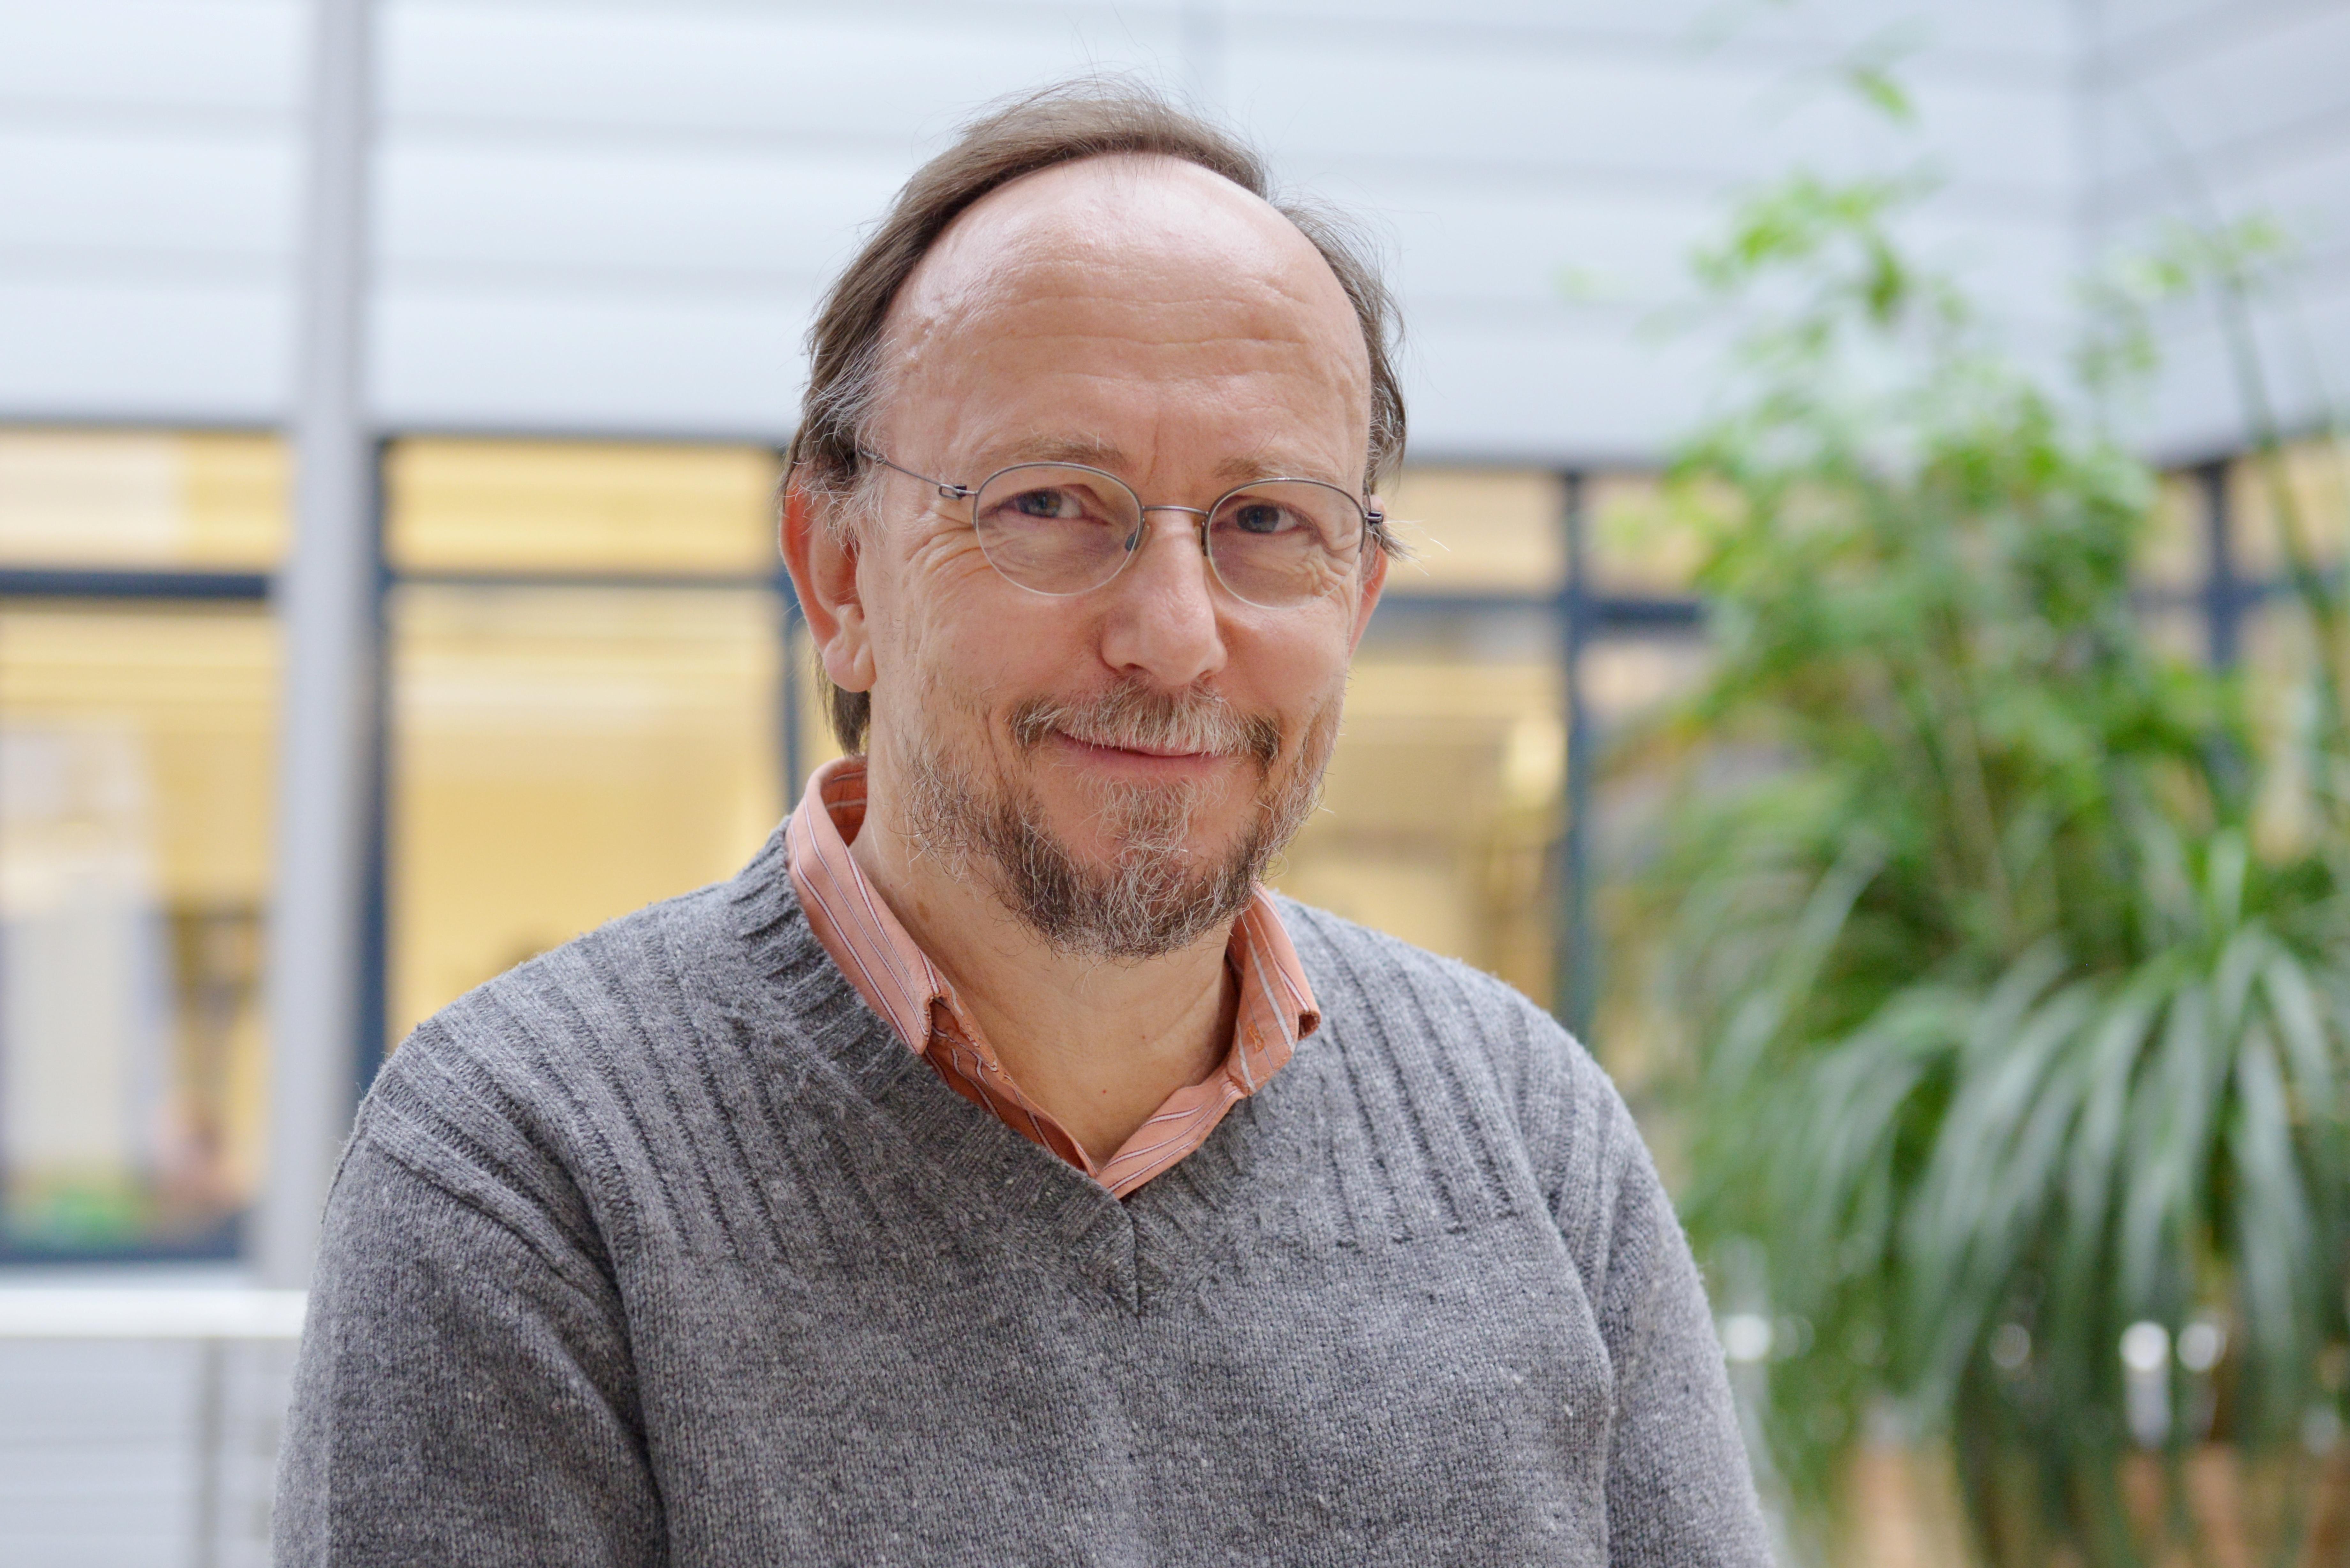 Thomas Böldicke